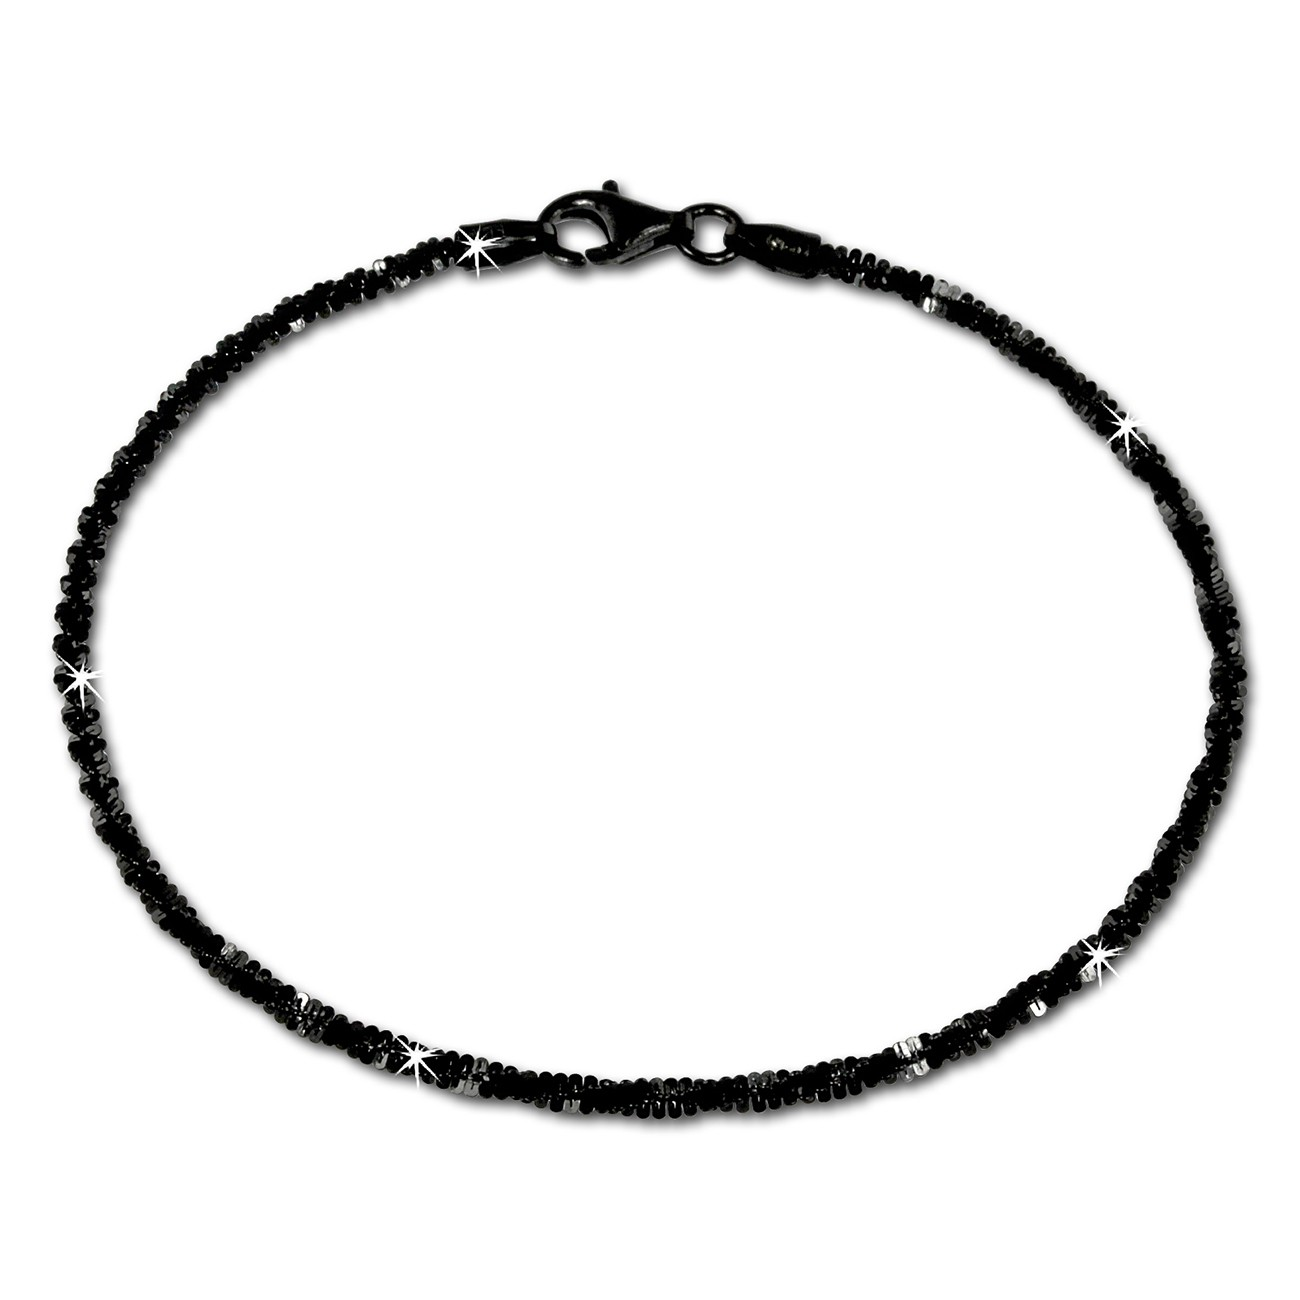 silberdream armband gedreht schwarz 925 silber damen sda2059s. Black Bedroom Furniture Sets. Home Design Ideas